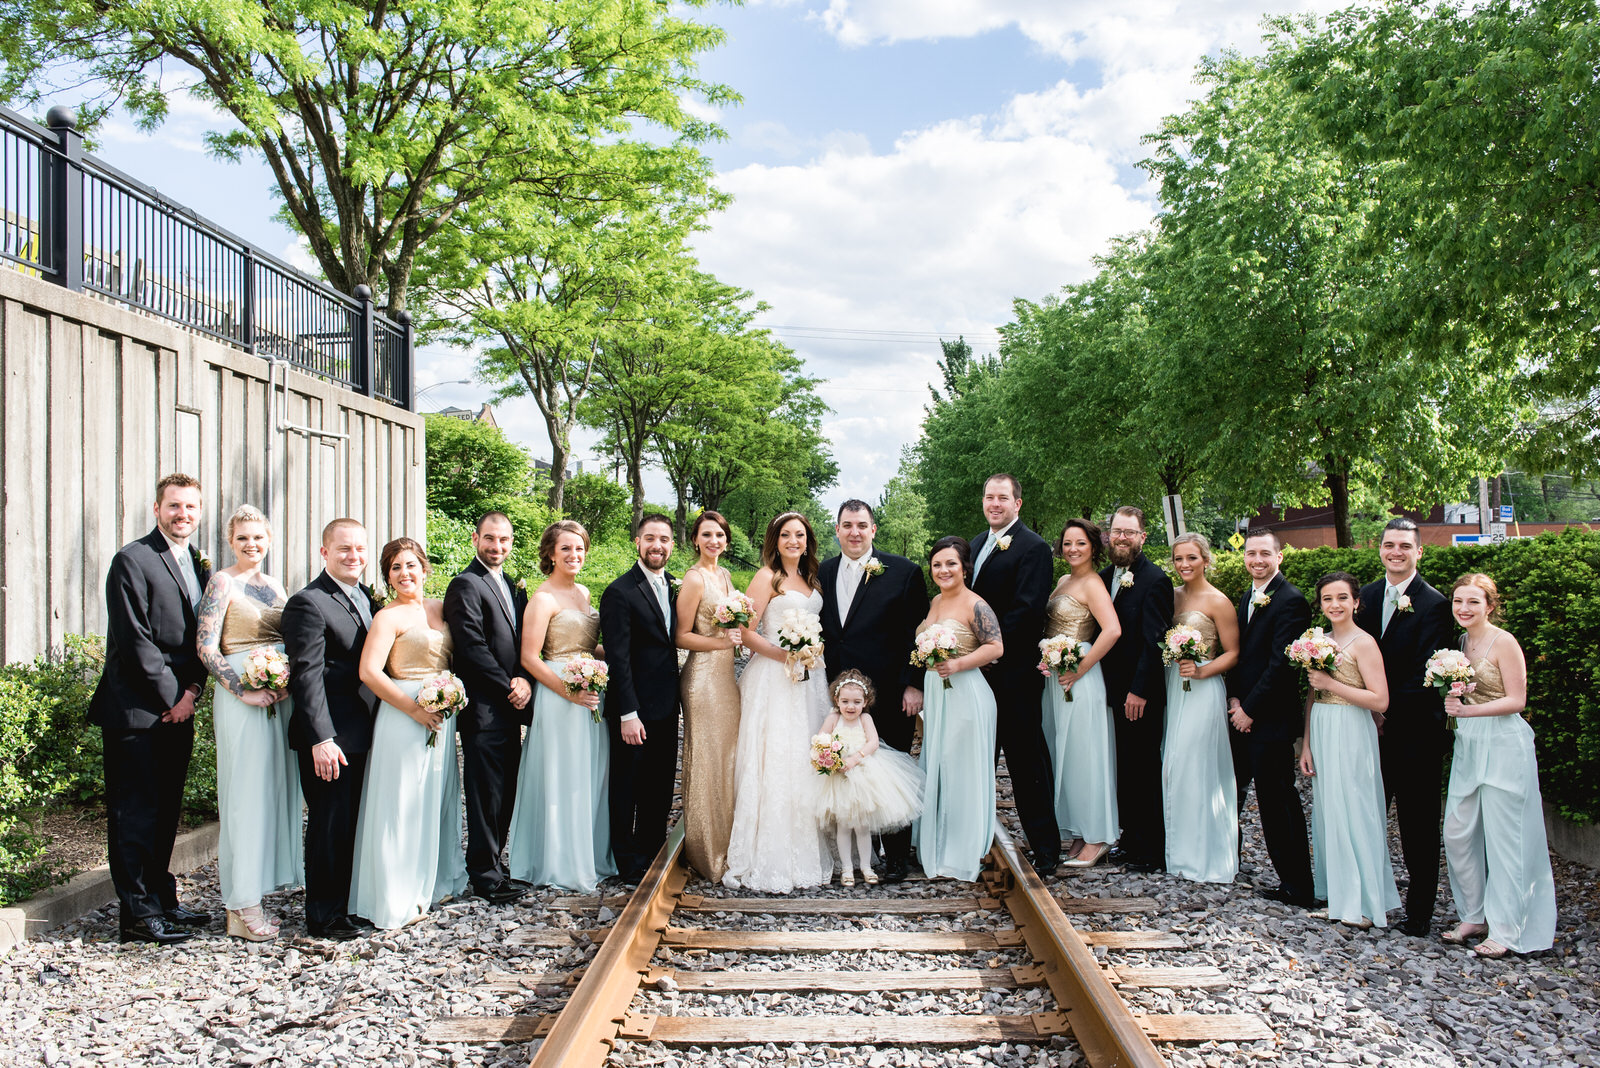 Laube_Banquet_Hall__Wedding_Photos_051.jpg